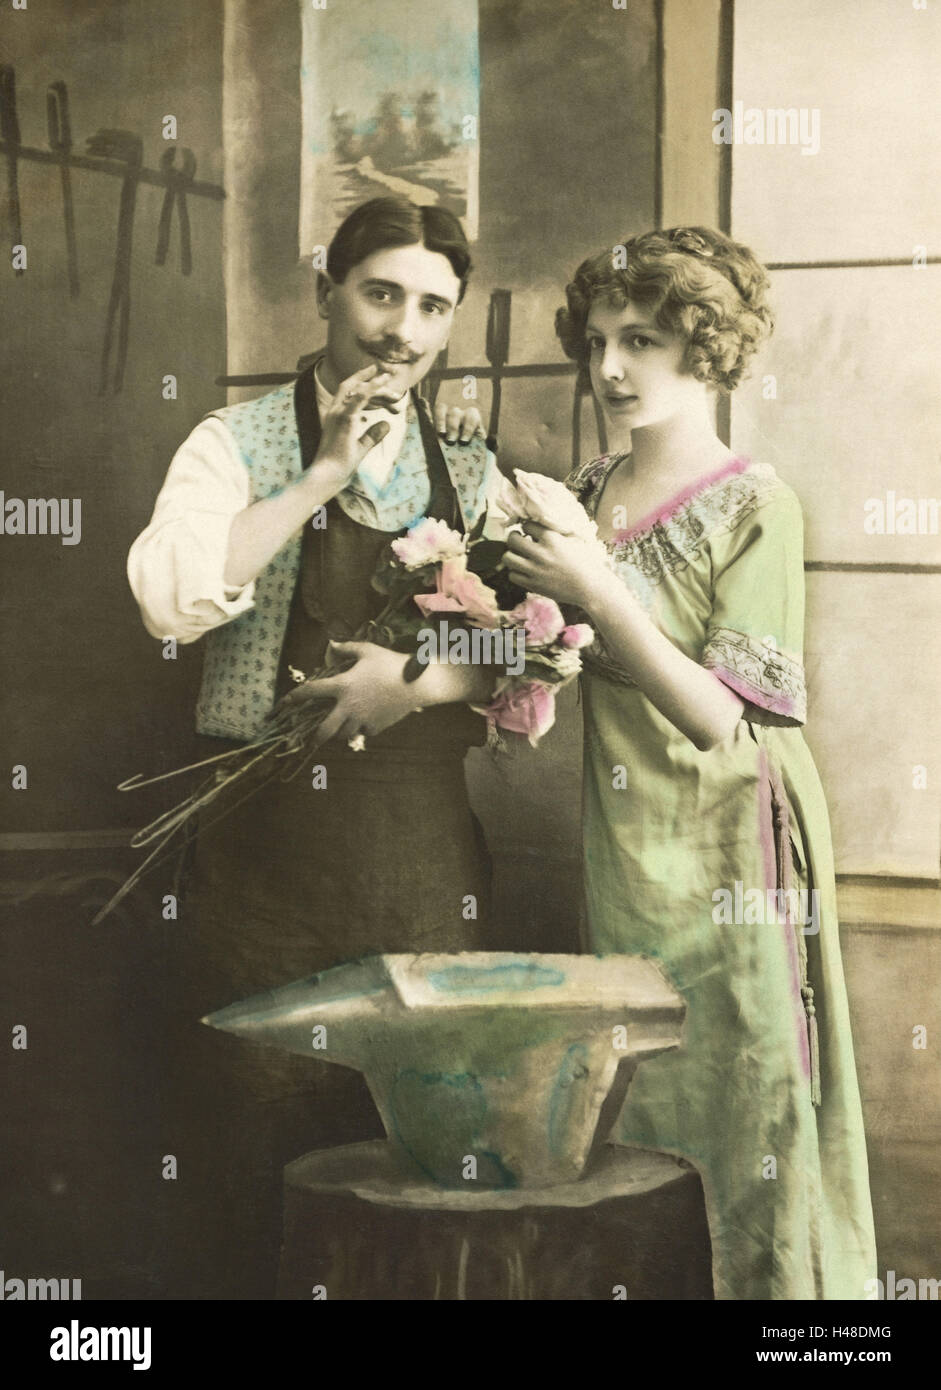 Nostalgia, greeting card, pair, forging, flowers, b/w colored, postcard, nostalgic, - Stock Image